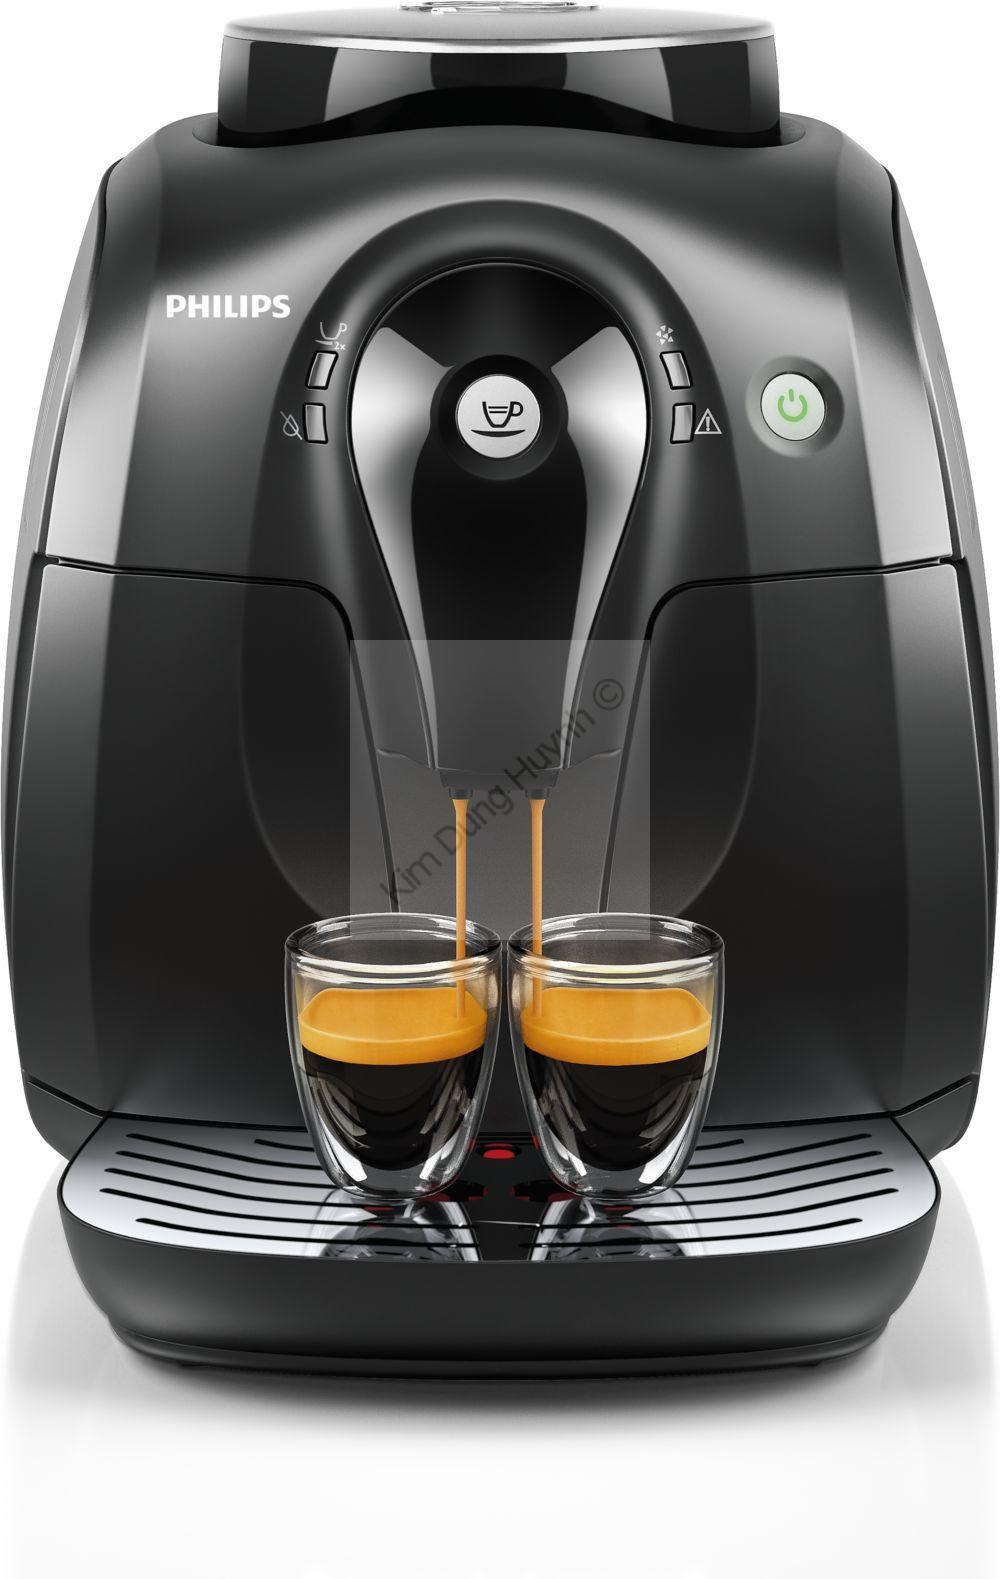 philips hd8650 01 kaffeevollautomat kaffeemaschine kaffee espresso maschine 8710103704751 ebay. Black Bedroom Furniture Sets. Home Design Ideas